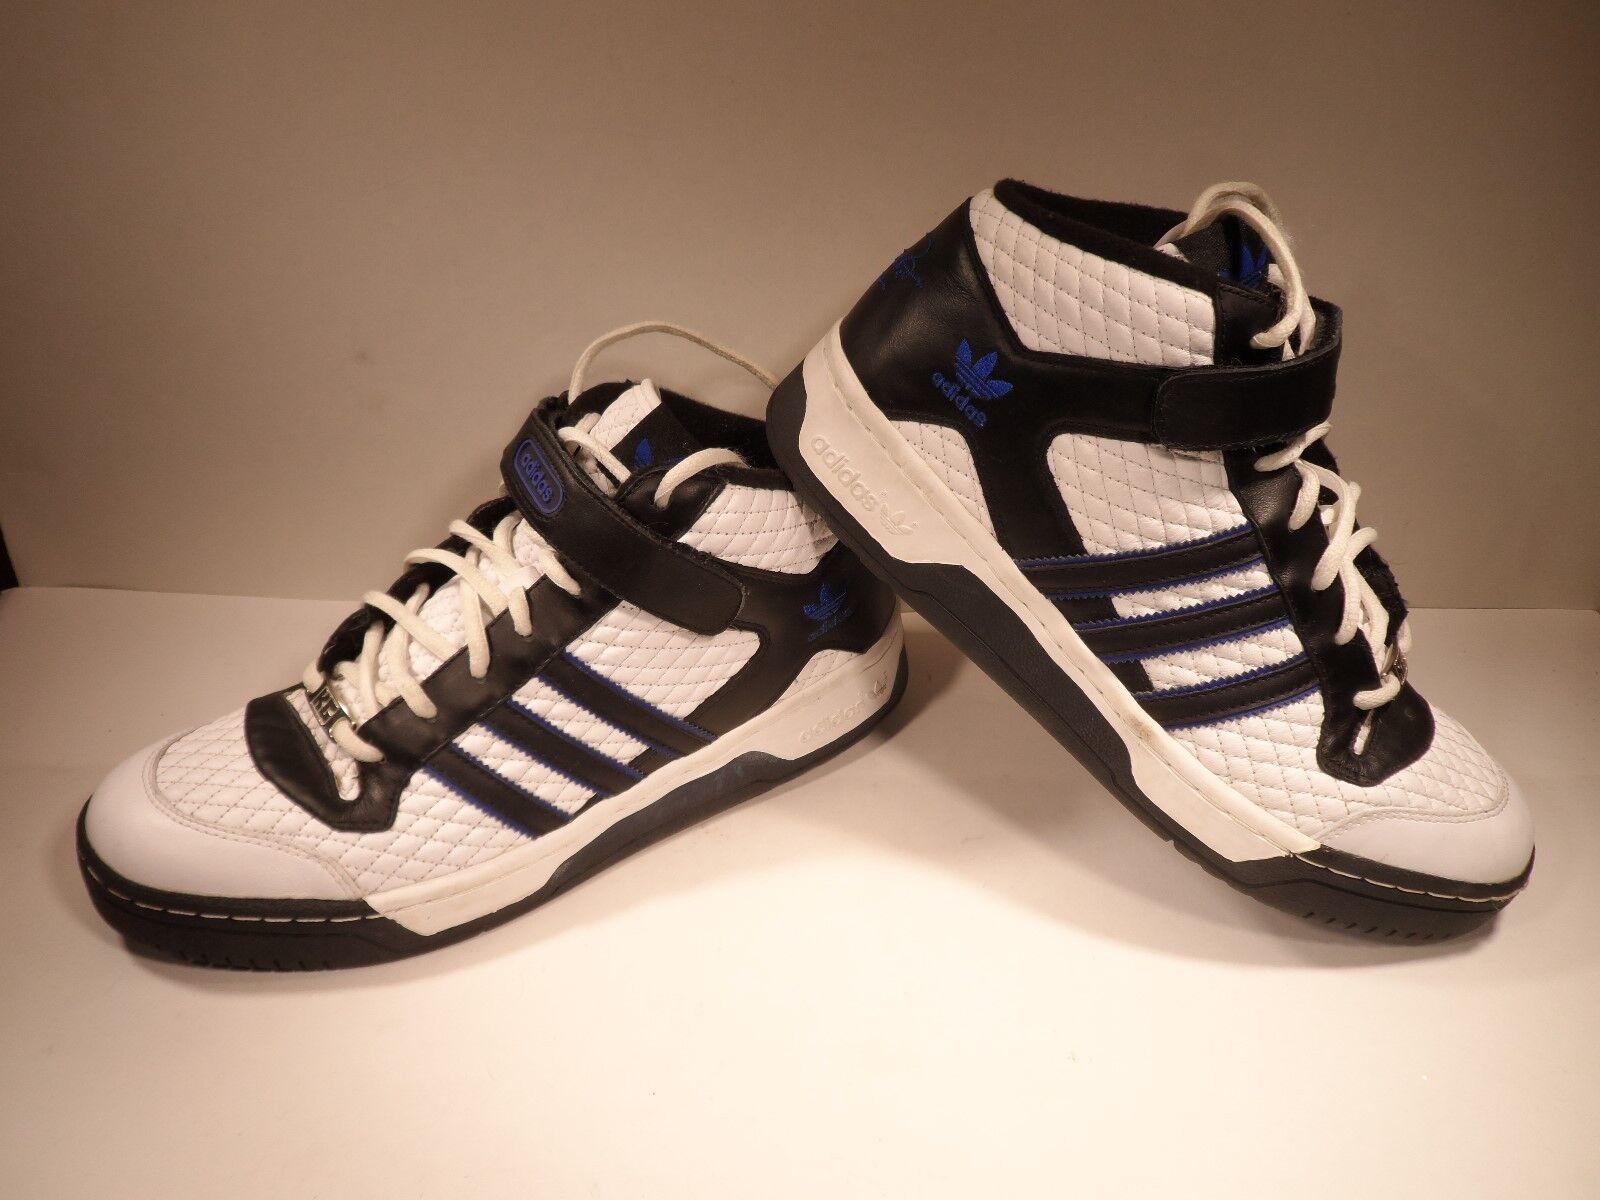 Adidas garnett basket 2004 uomini 10,5 kg / atletico bianco / nero / kg rb - assorbenti! 2da442